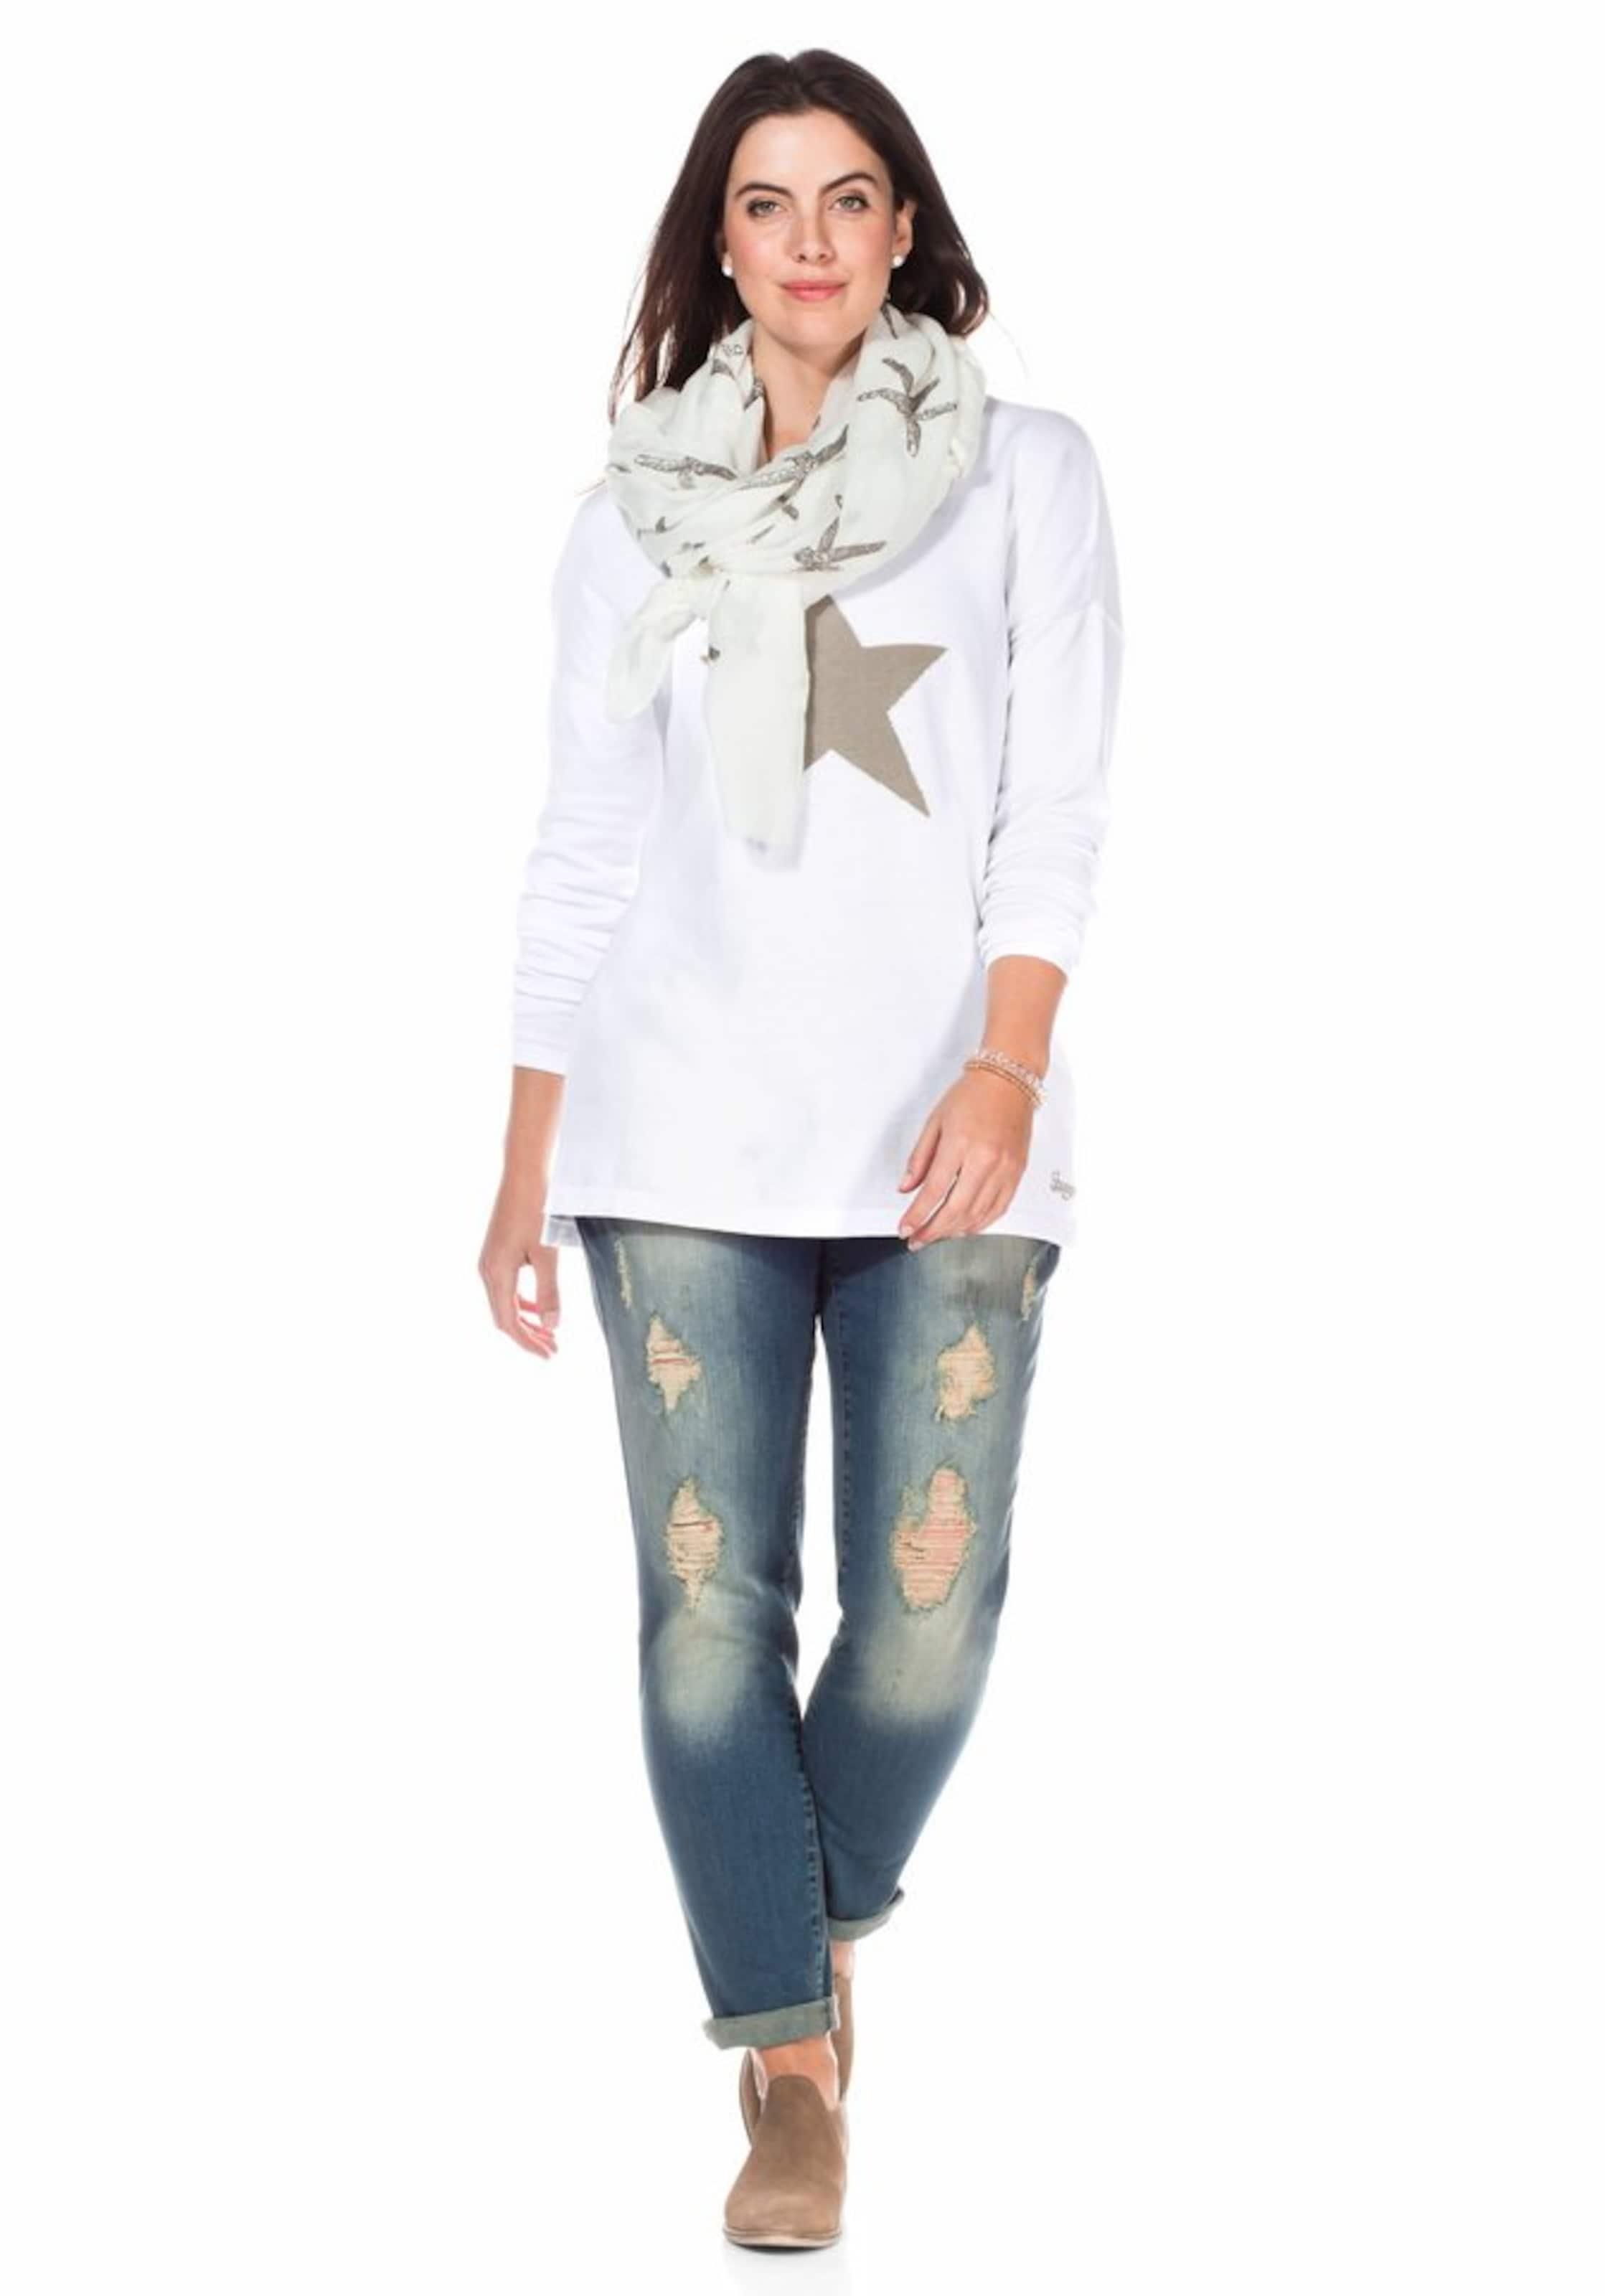 2018 Unisex Verkauf Online Freies Modernes Verschiffen sheego casual Pullover Perfekt Günstig Online Online Footlocker Abbildungen Günstigen Preis AkGXRqpJu